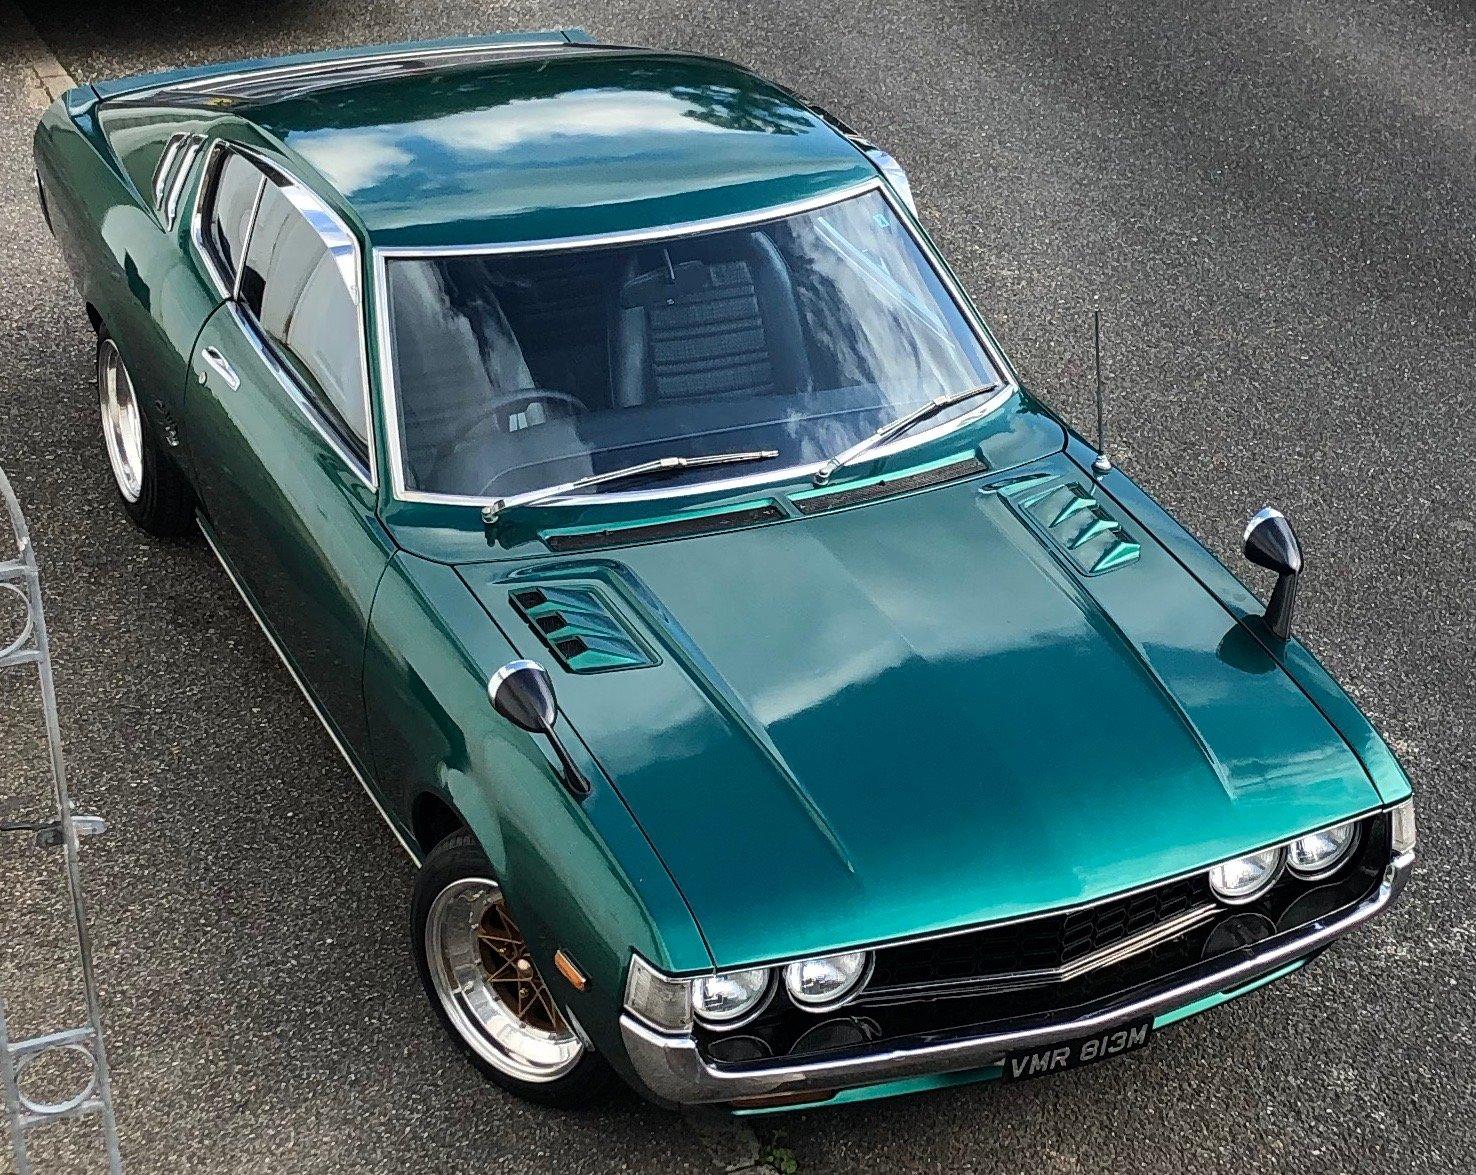 1974 Toyota Celica Liftback 2TG TA27 JDM RA25 TA22  For Sale (picture 1 of 6)